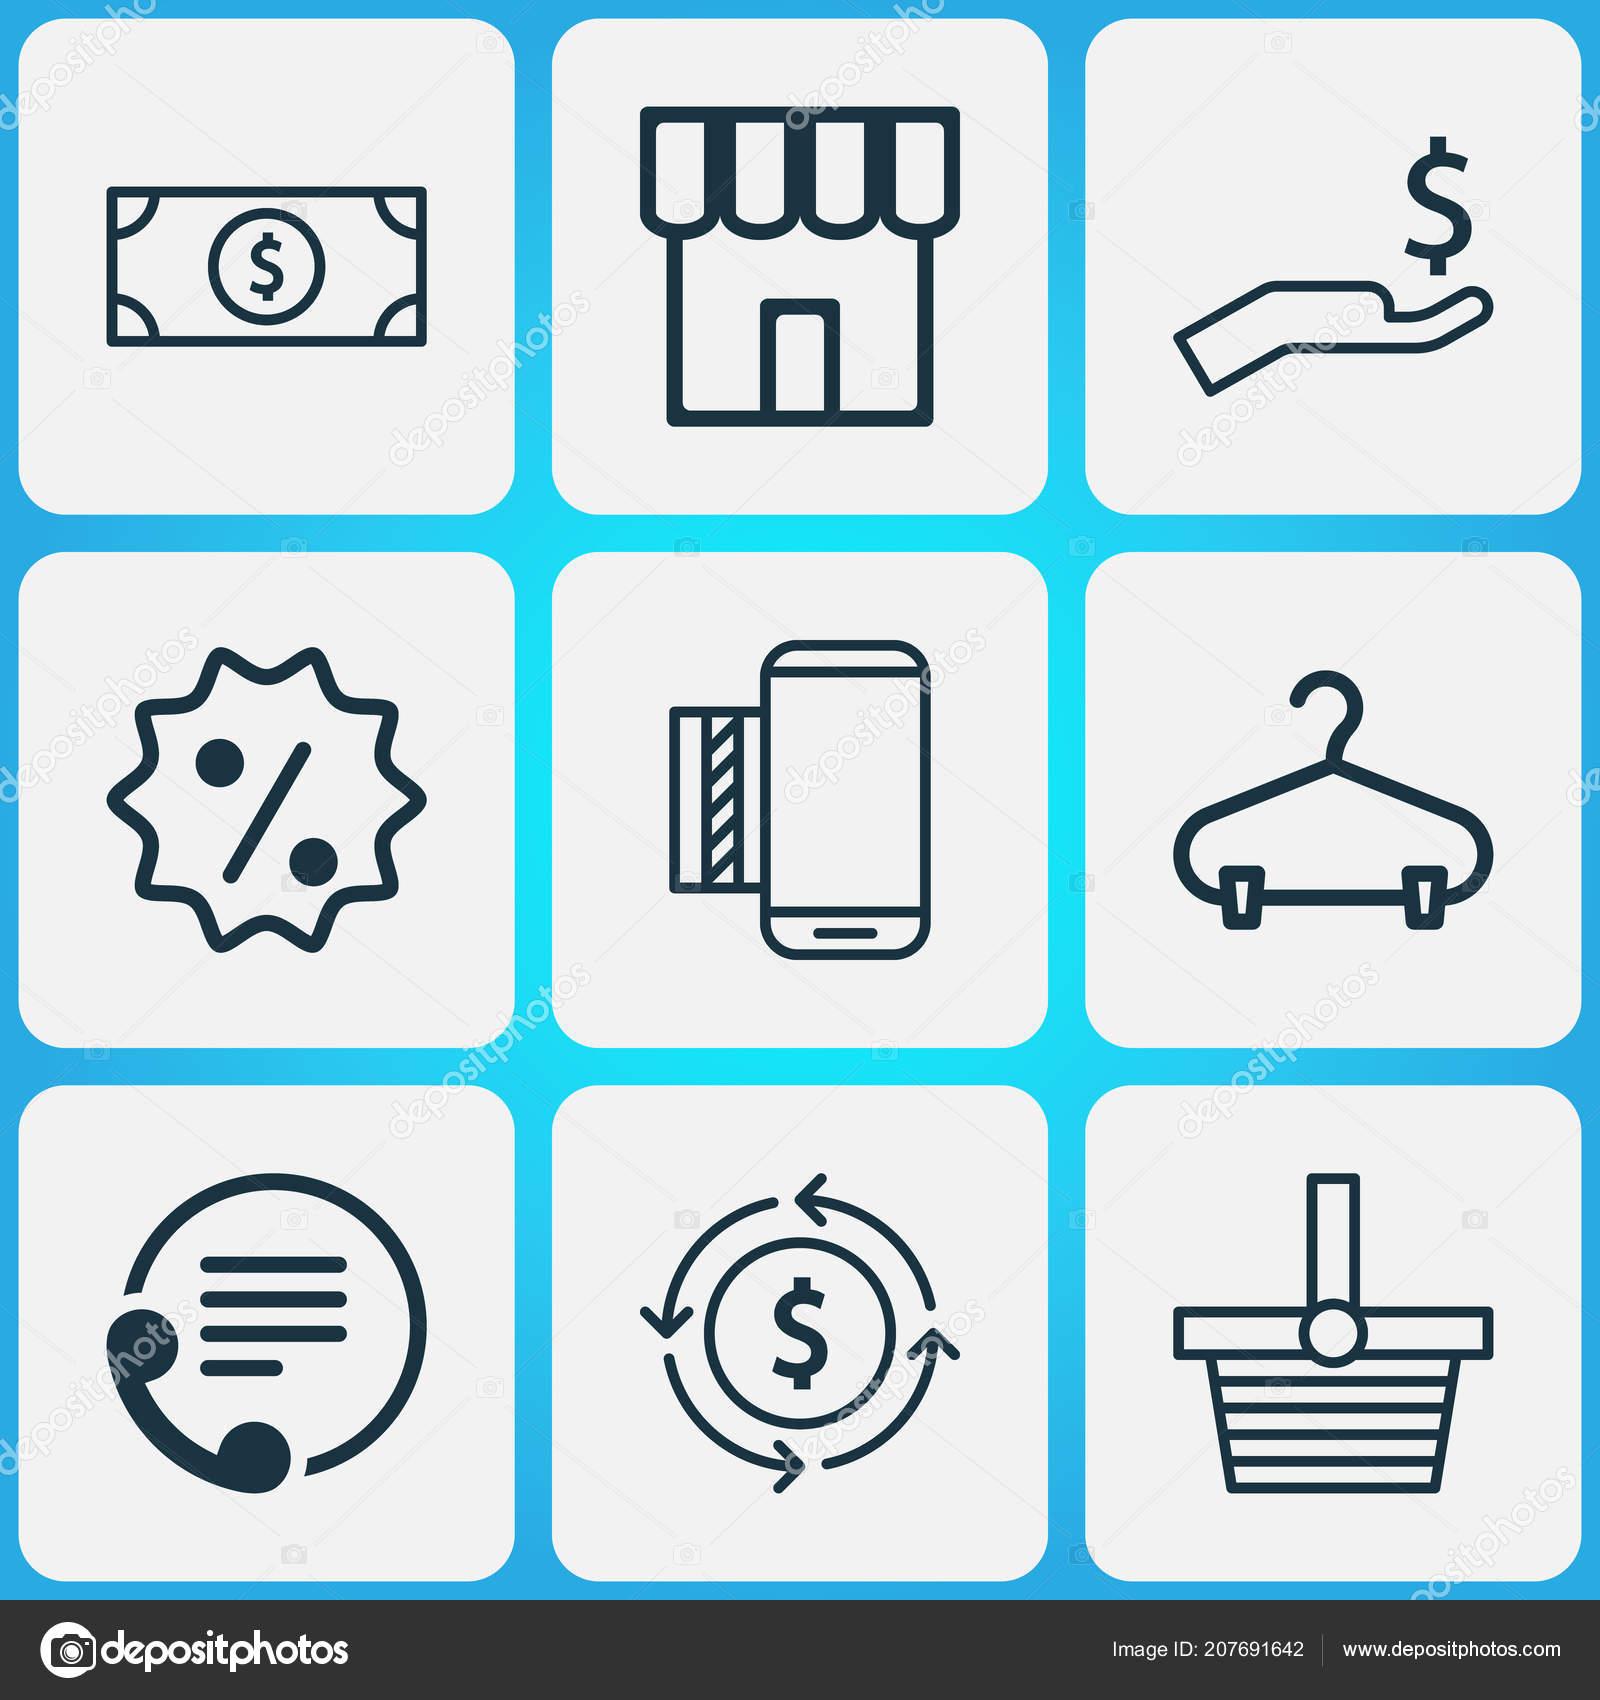 E-commerce εικονίδια με το σήμα πώλησης 5bf7dcd4de3